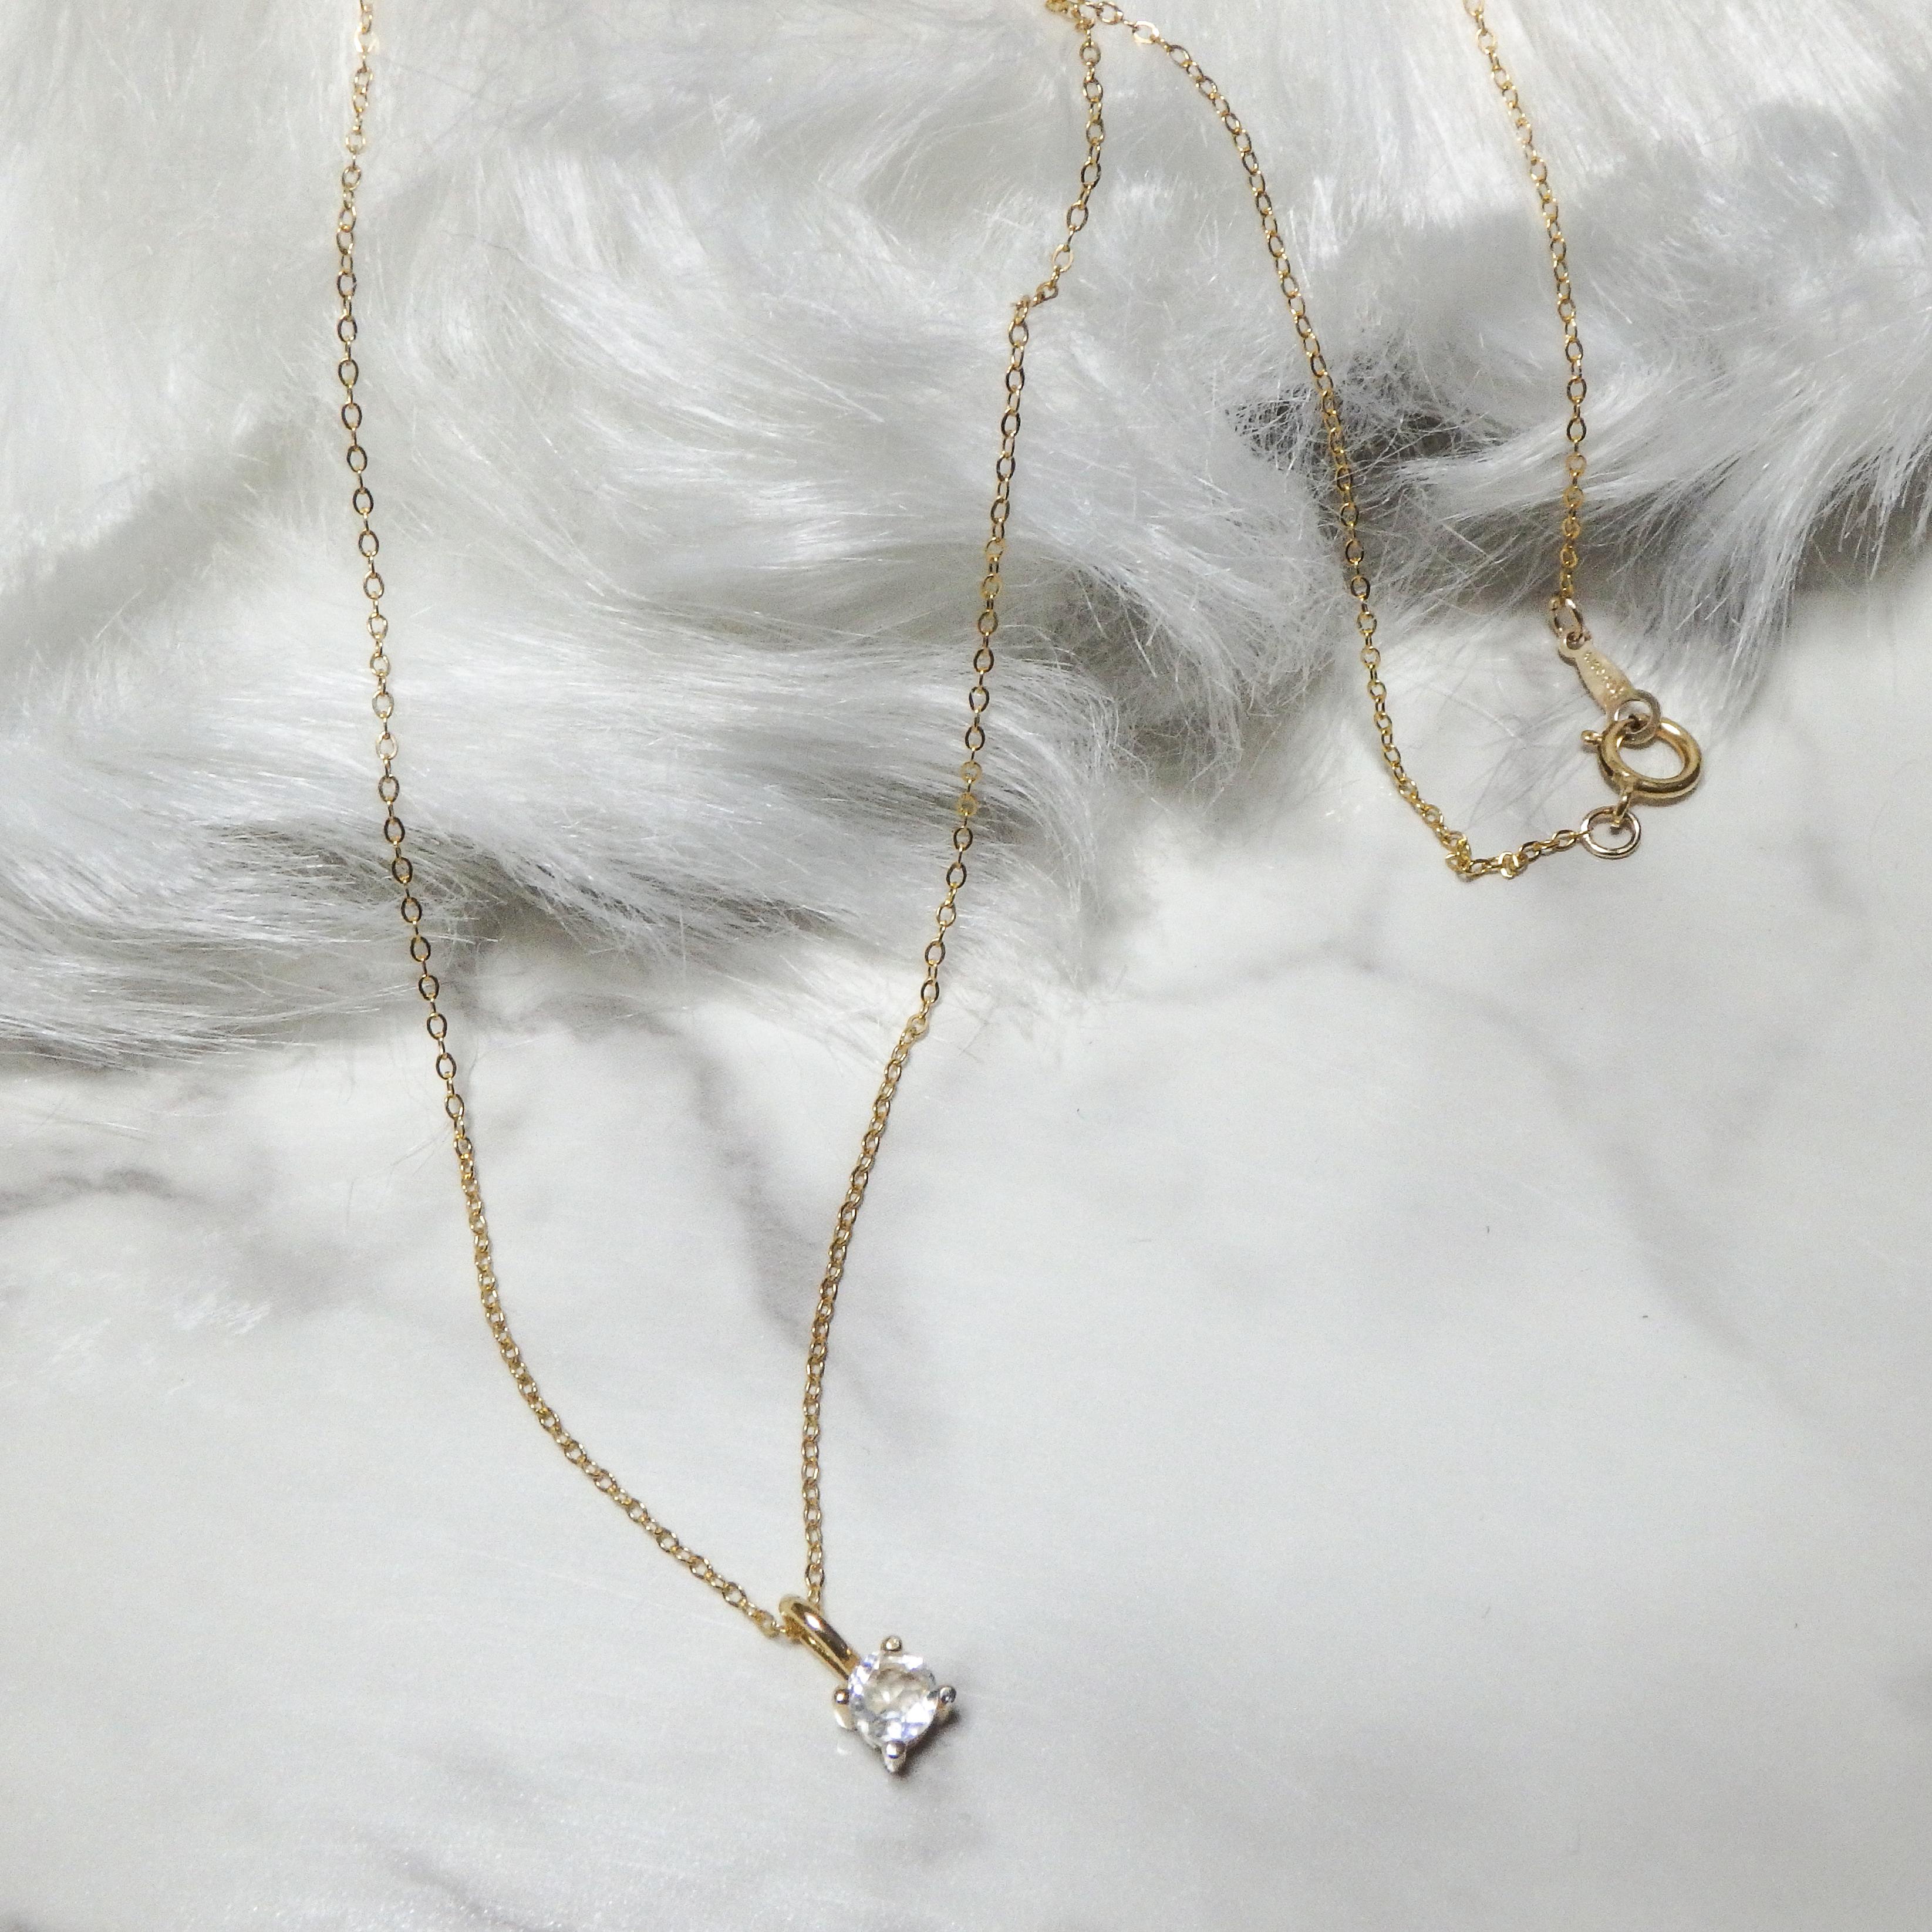 4㎜ Rainbow Moon Stone Necklace